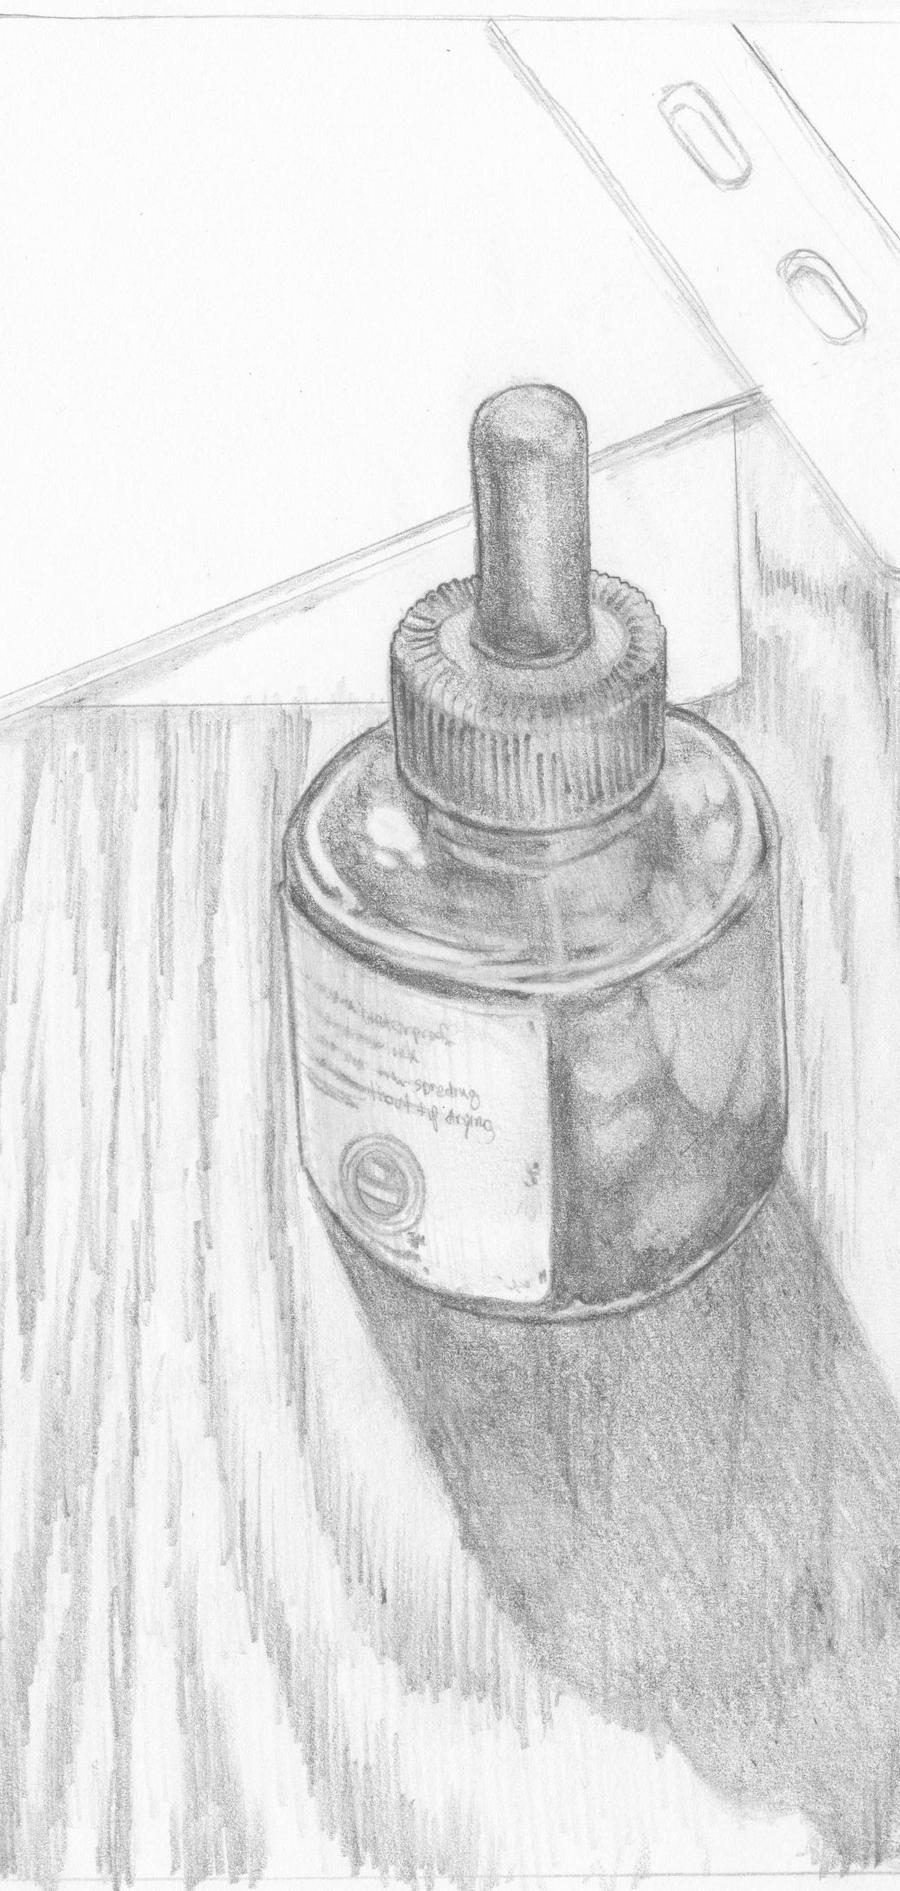 Life Drawing - Ink Bottle by ThirteenthBullet on DeviantArt